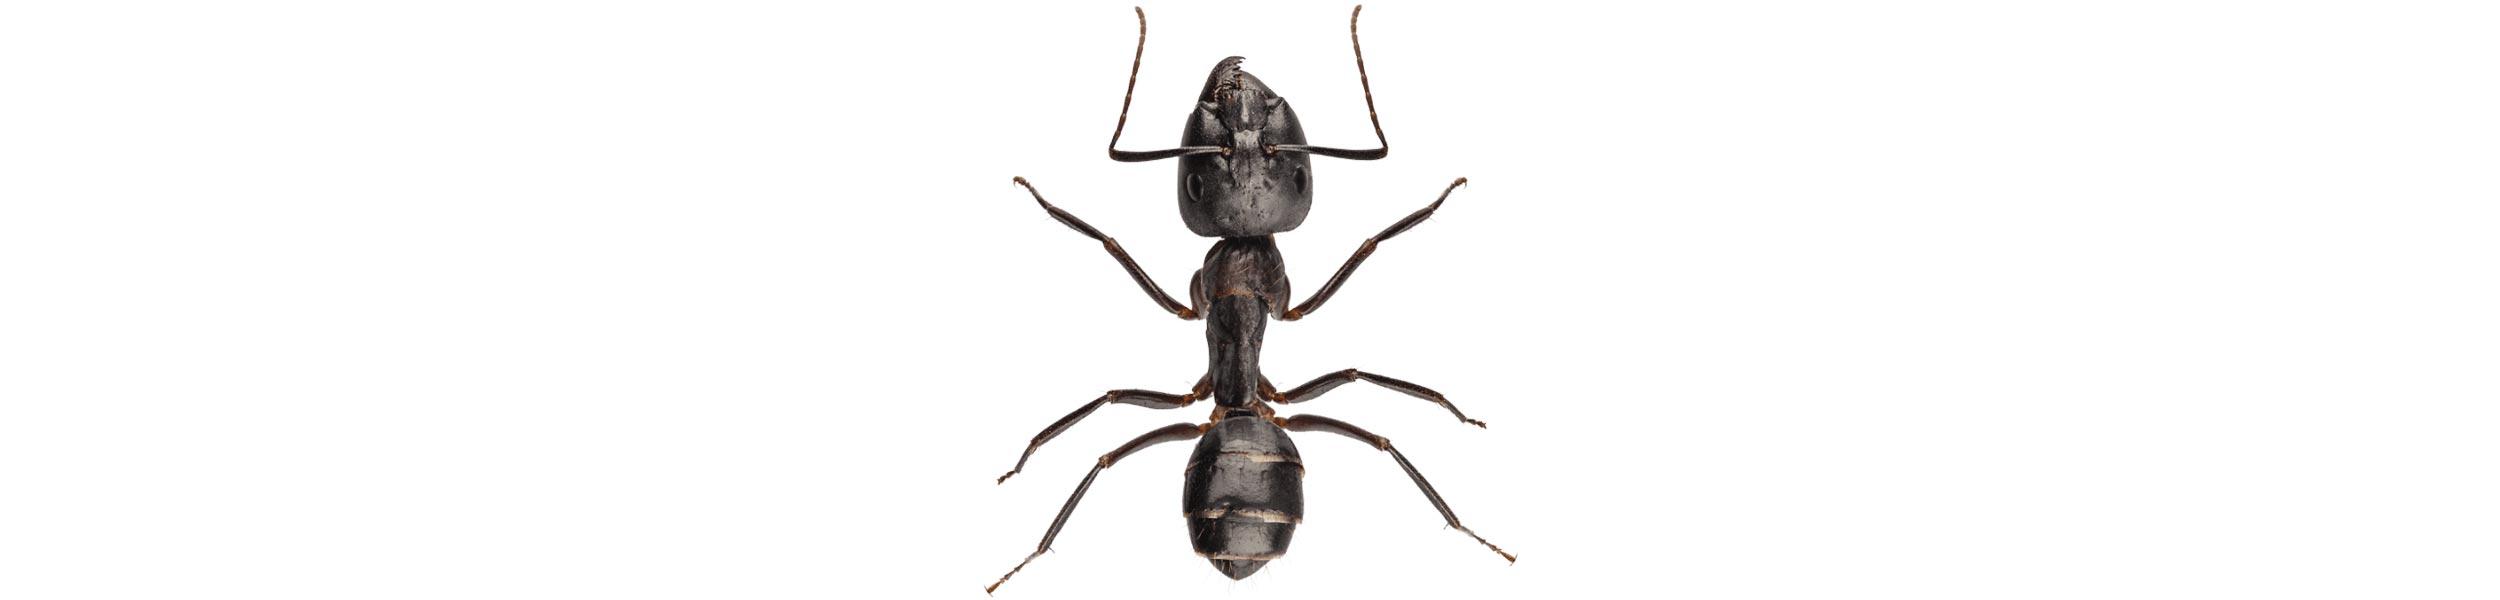 OPC Pest Control - Ants Header